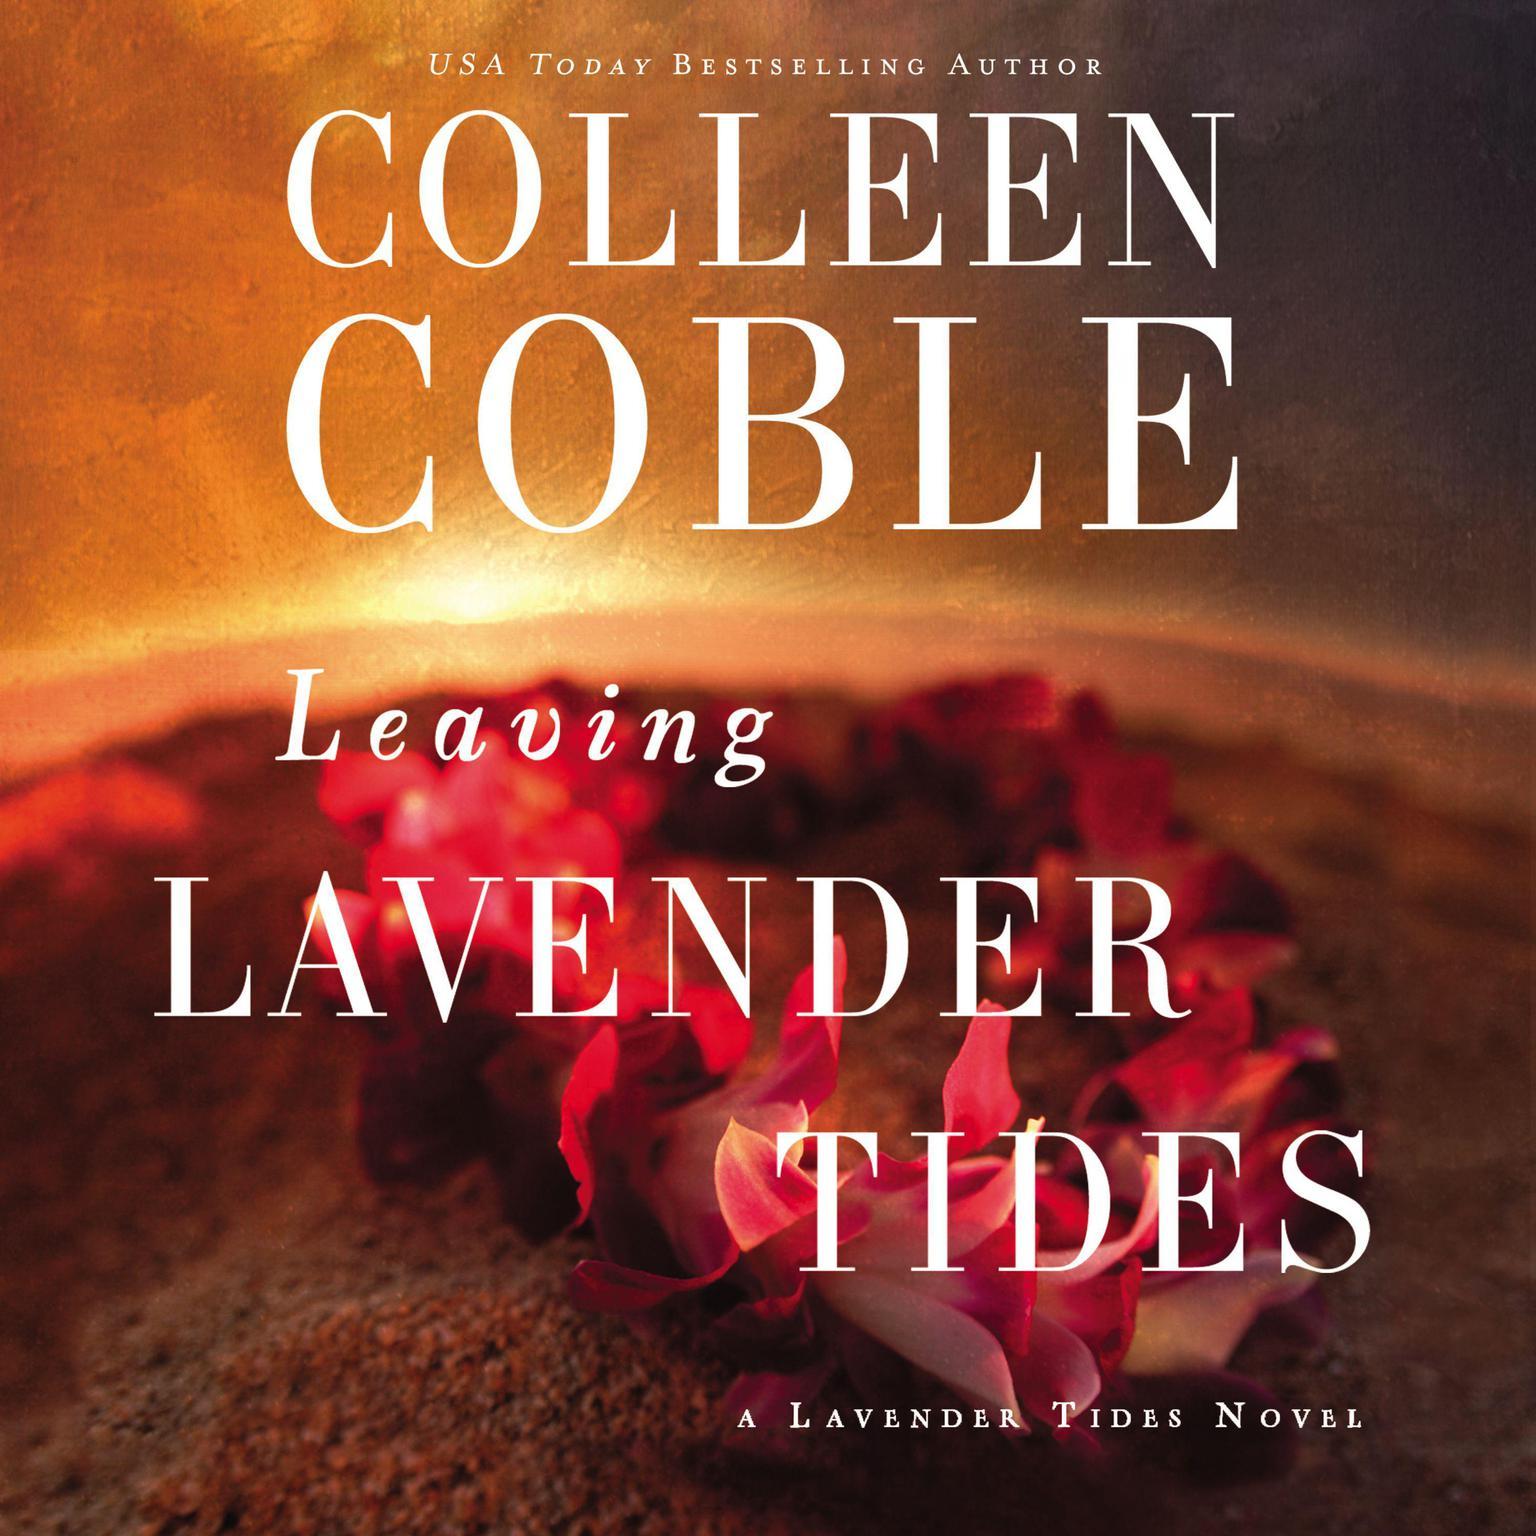 Leaving Lavender Tides: A Lavender Tides Novella Audiobook, by Colleen Coble